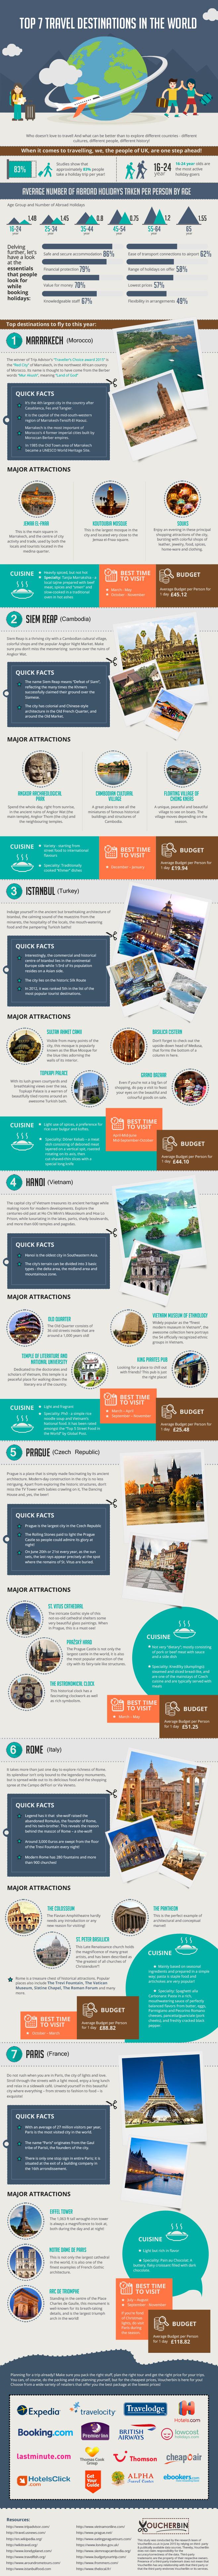 voucherbin-infographic-top-travel-destinations-in-the-world